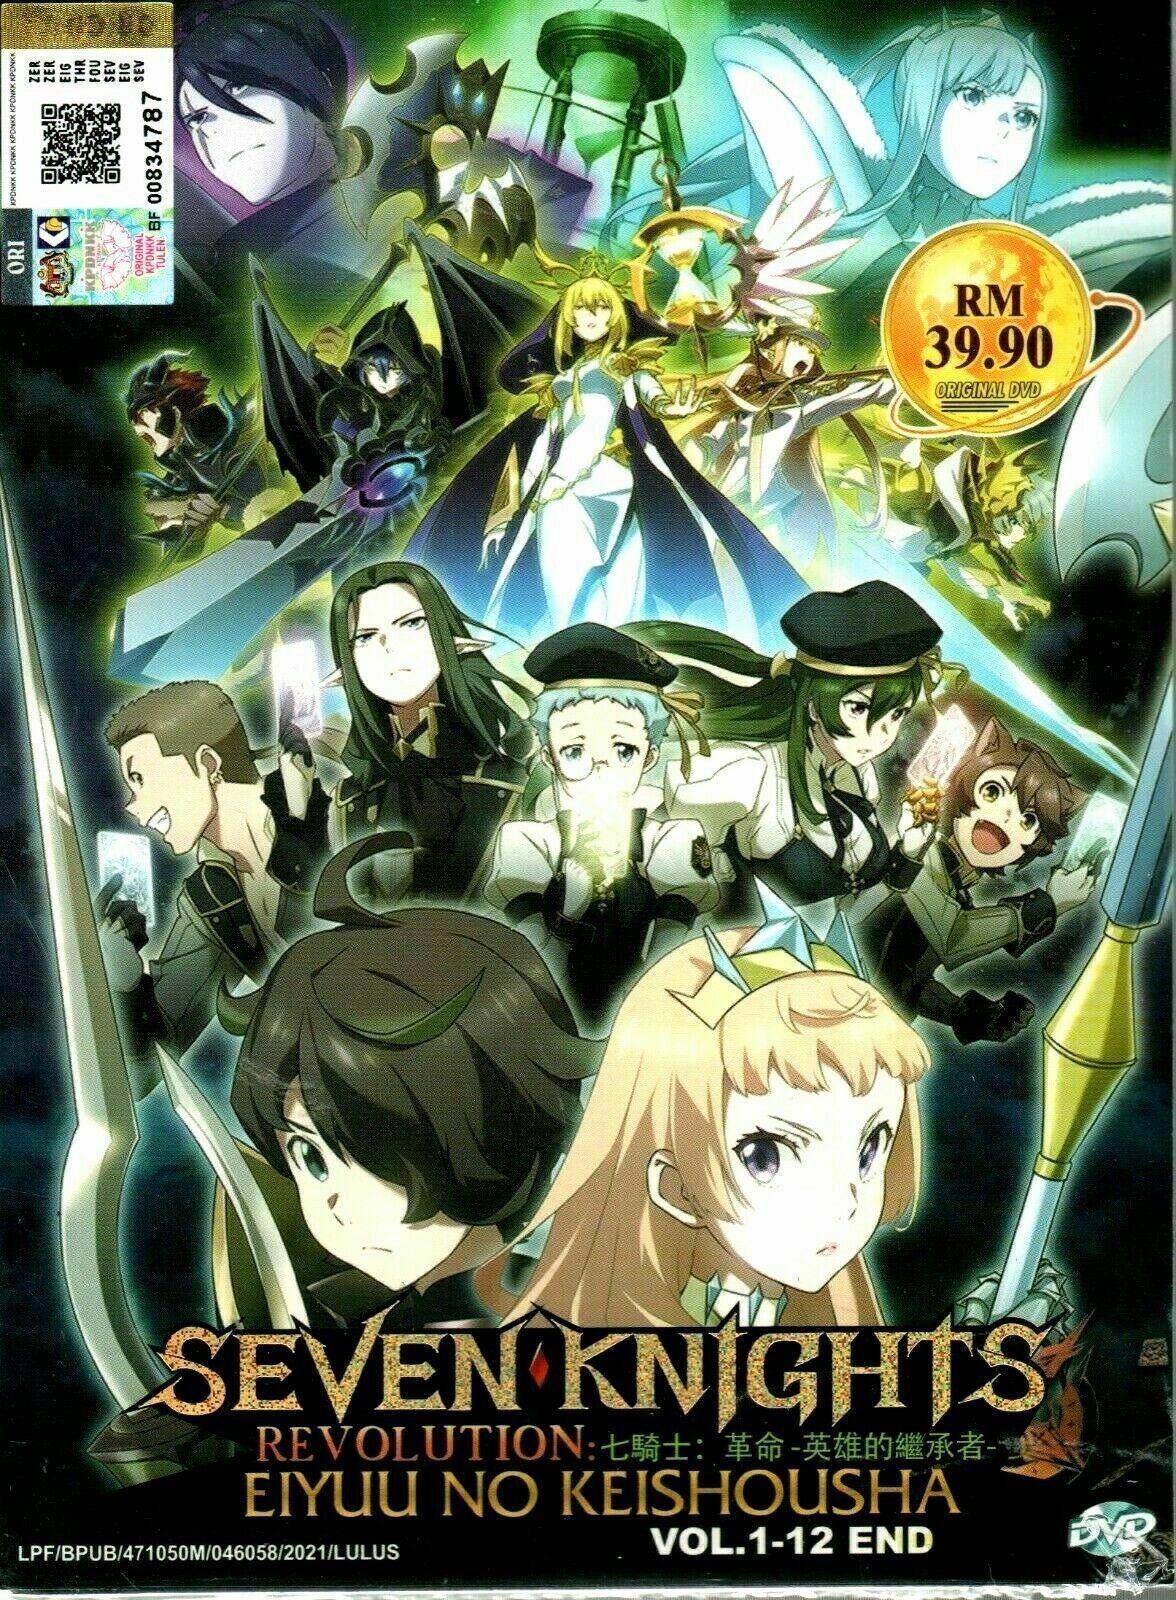 Seven Knights Revolution: Eiyuu No Keishousha Vol.1-12 End Ship From USA